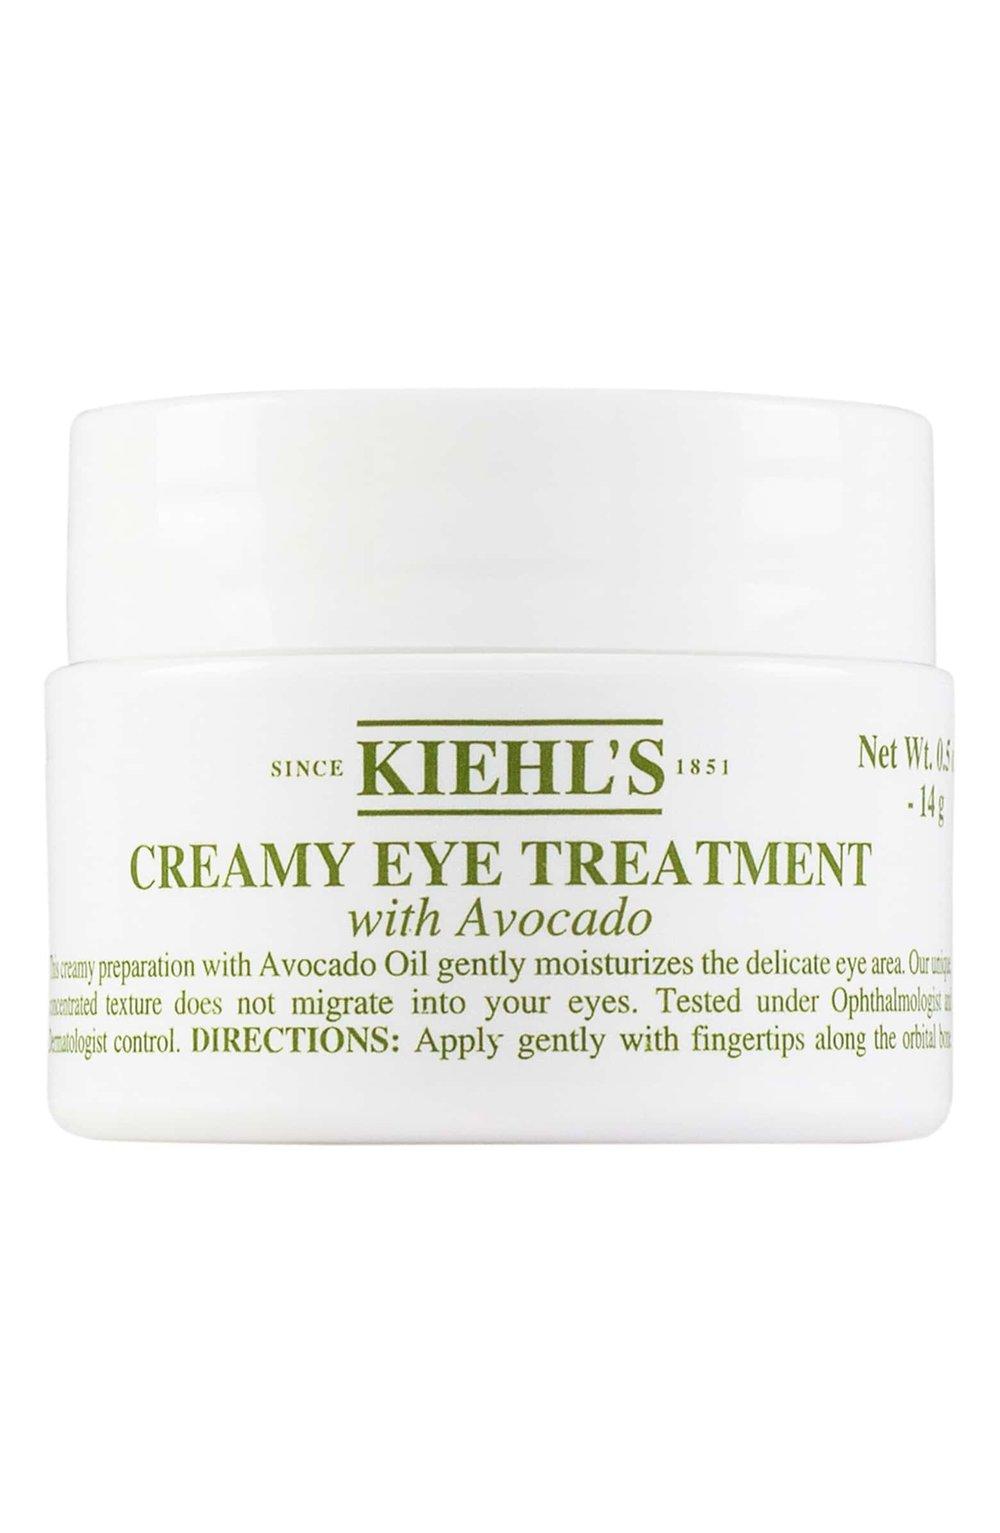 Kiehl's Eye Treatment $29.00 -